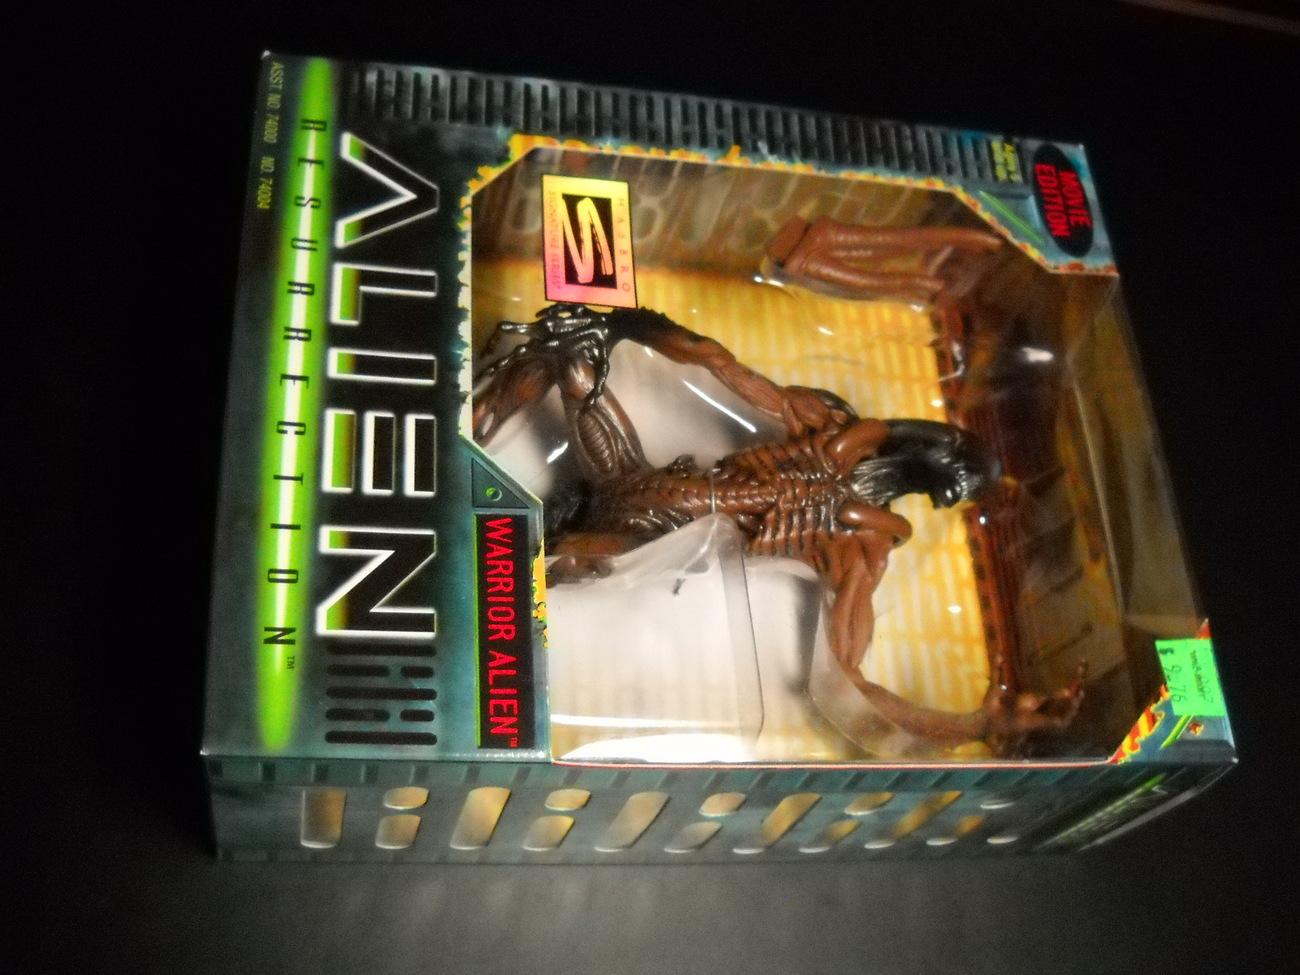 Toy aliens kenner hasbro 1997 alien resurrection warior alien boxed sealed 01